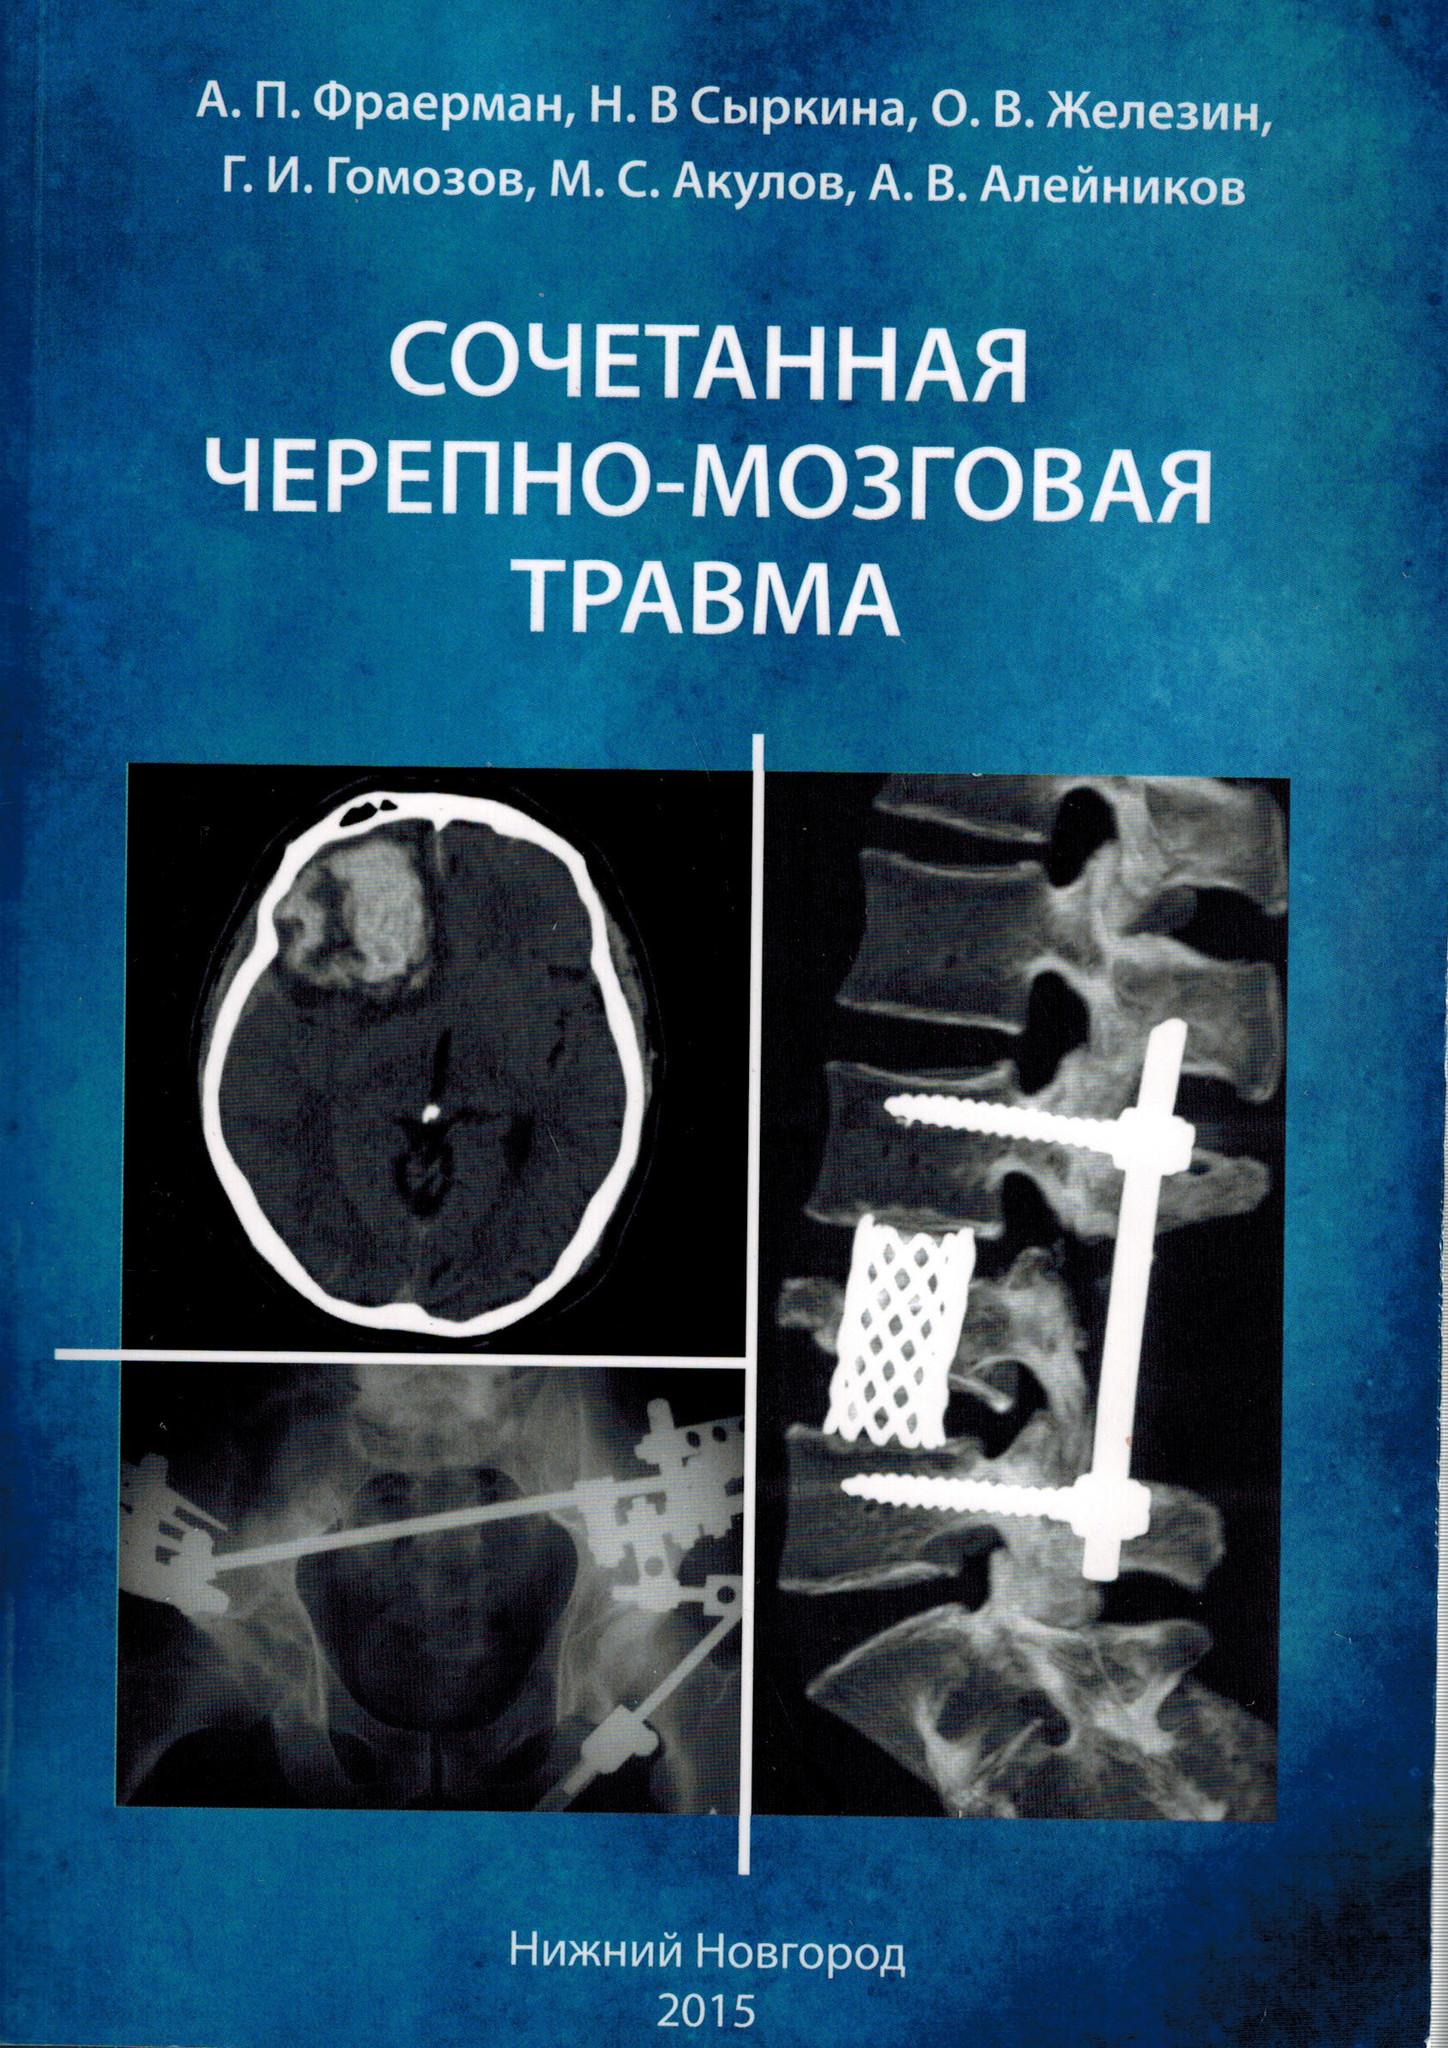 Новинки Сочетанная черепно-мозговая травма sochet_cherep.jpg